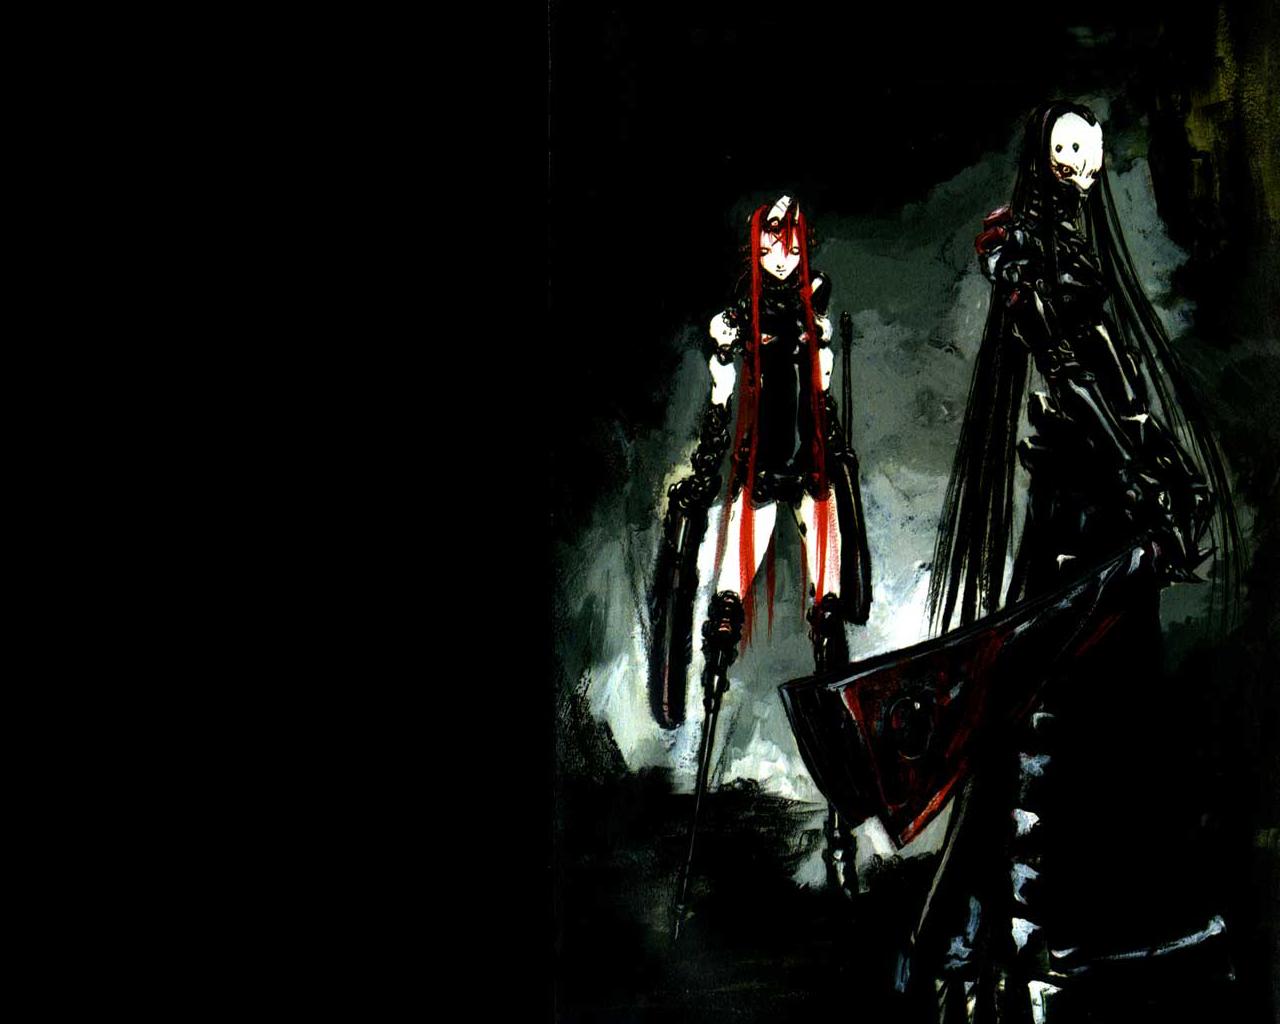 Cyber Goth Wallpaper Bilders 1280x1024